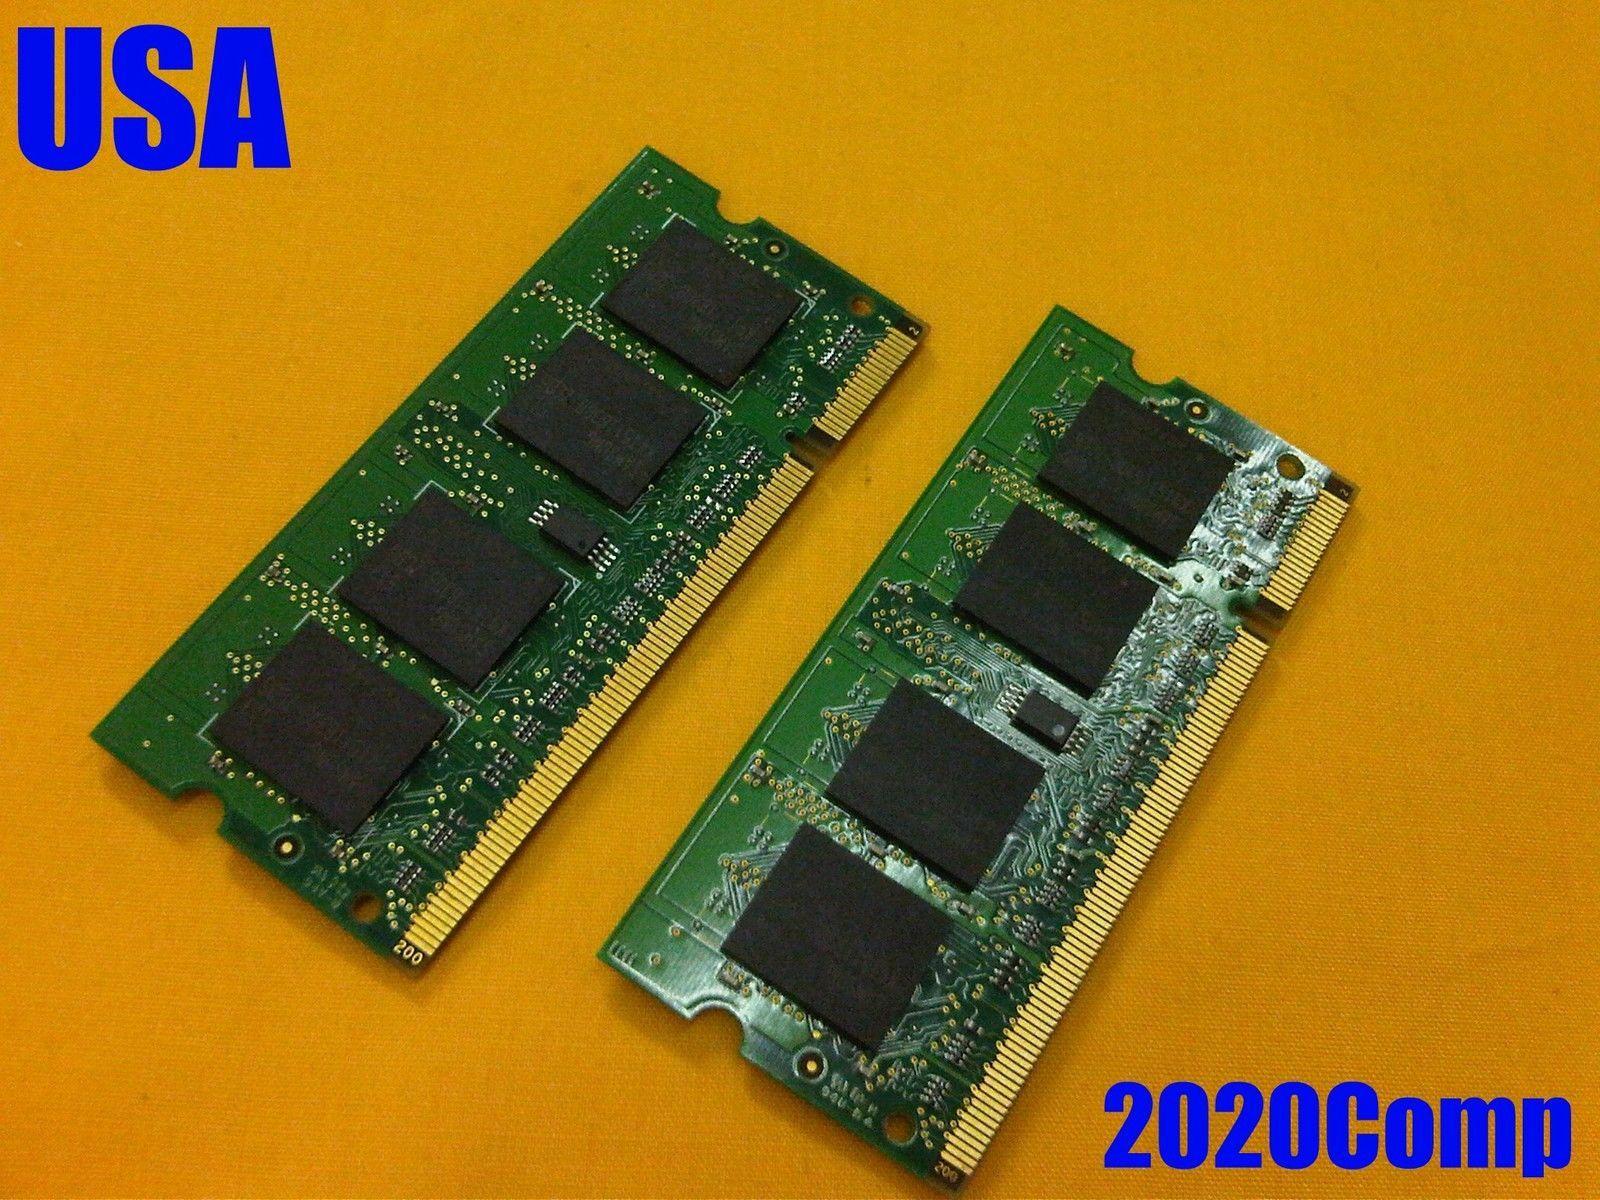 1gb 2 X 512mb Ram Memory Tested Acer Aspire 5532 5516 5517 Ddr2 Pc 6400 Dan 5300